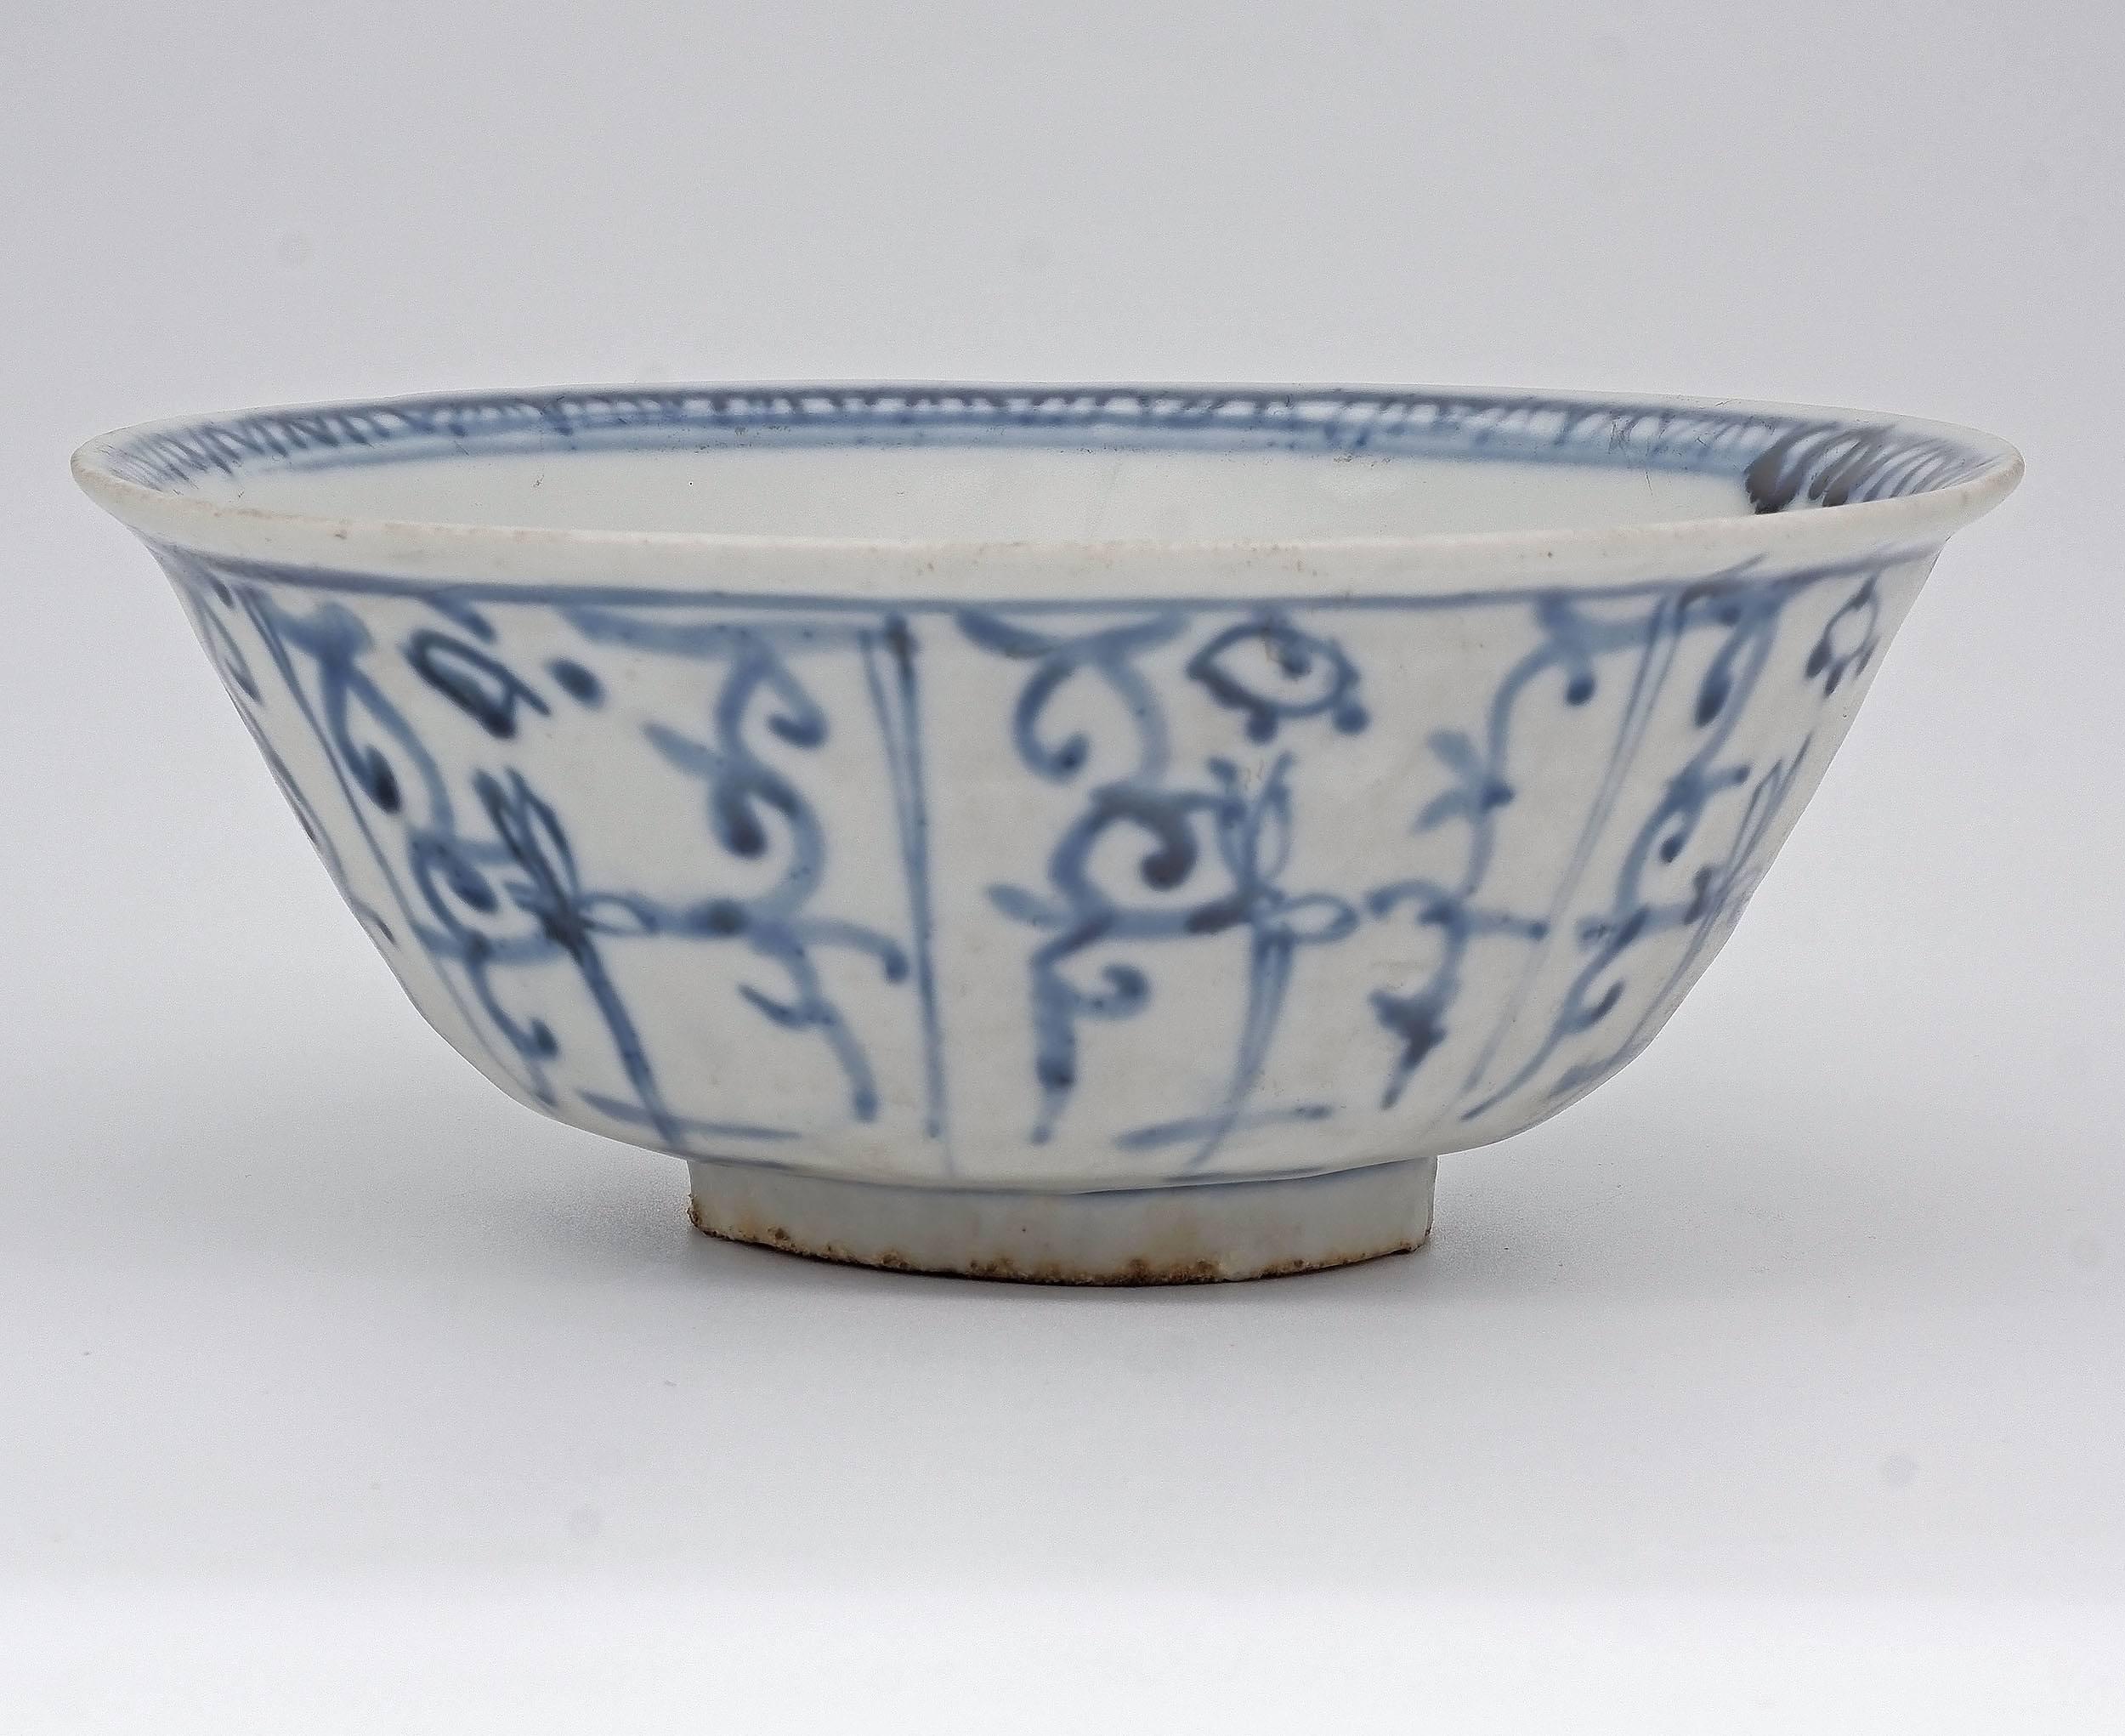 'Chinese Zhangzhou Fujian Ware Blue and White Deep Bowl, Ming Dynasty 15th/16th Century'